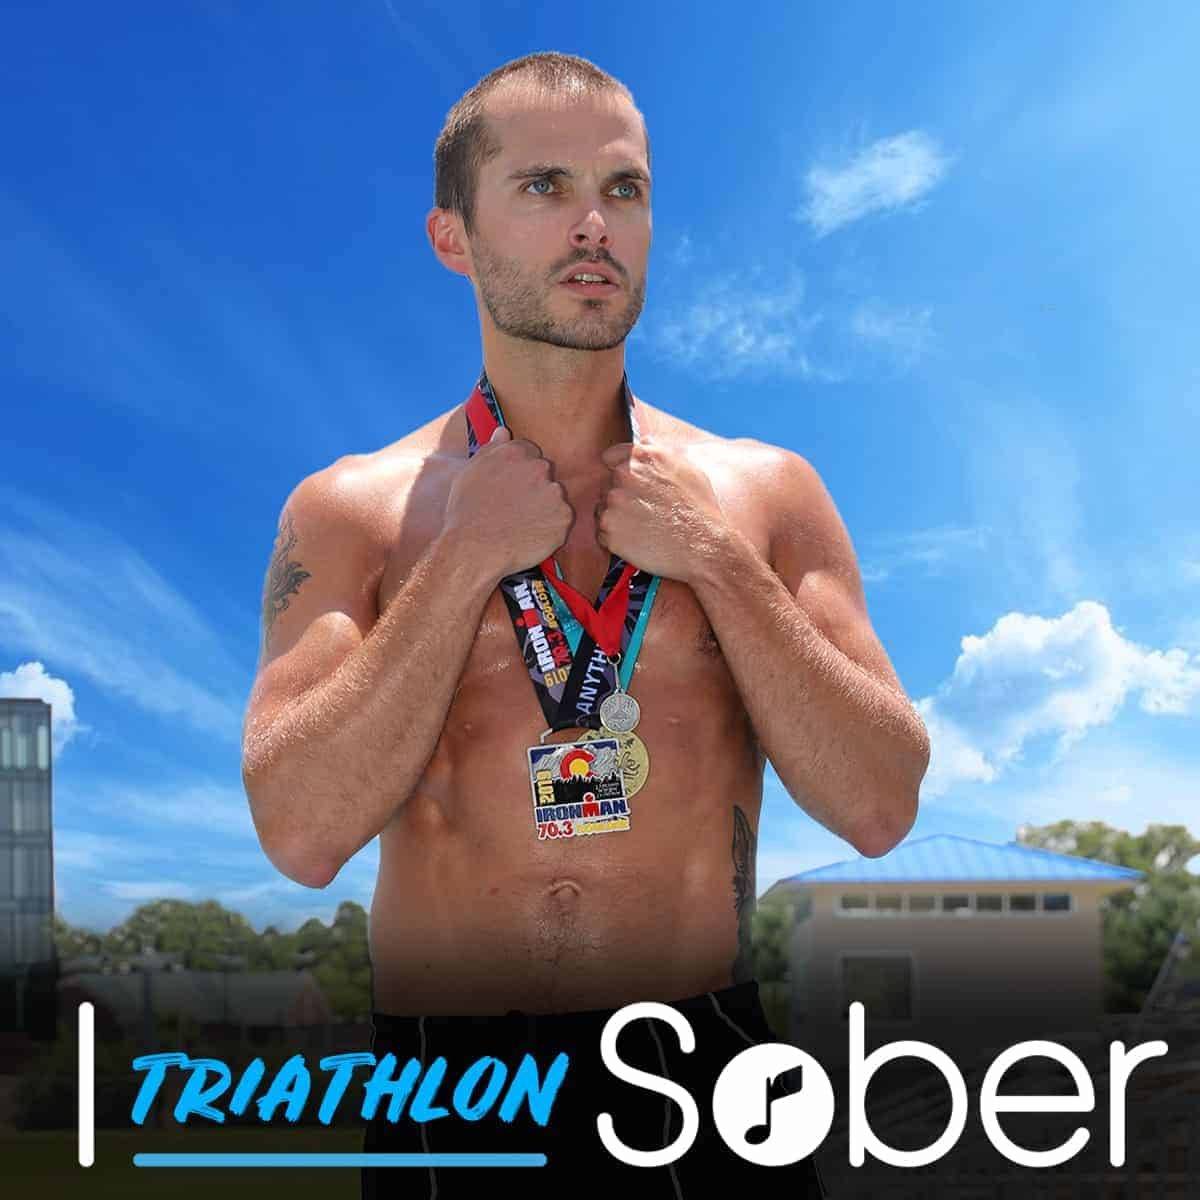 Recovery Unplugged Interviews Sober Triathlete Mark Turnipseed